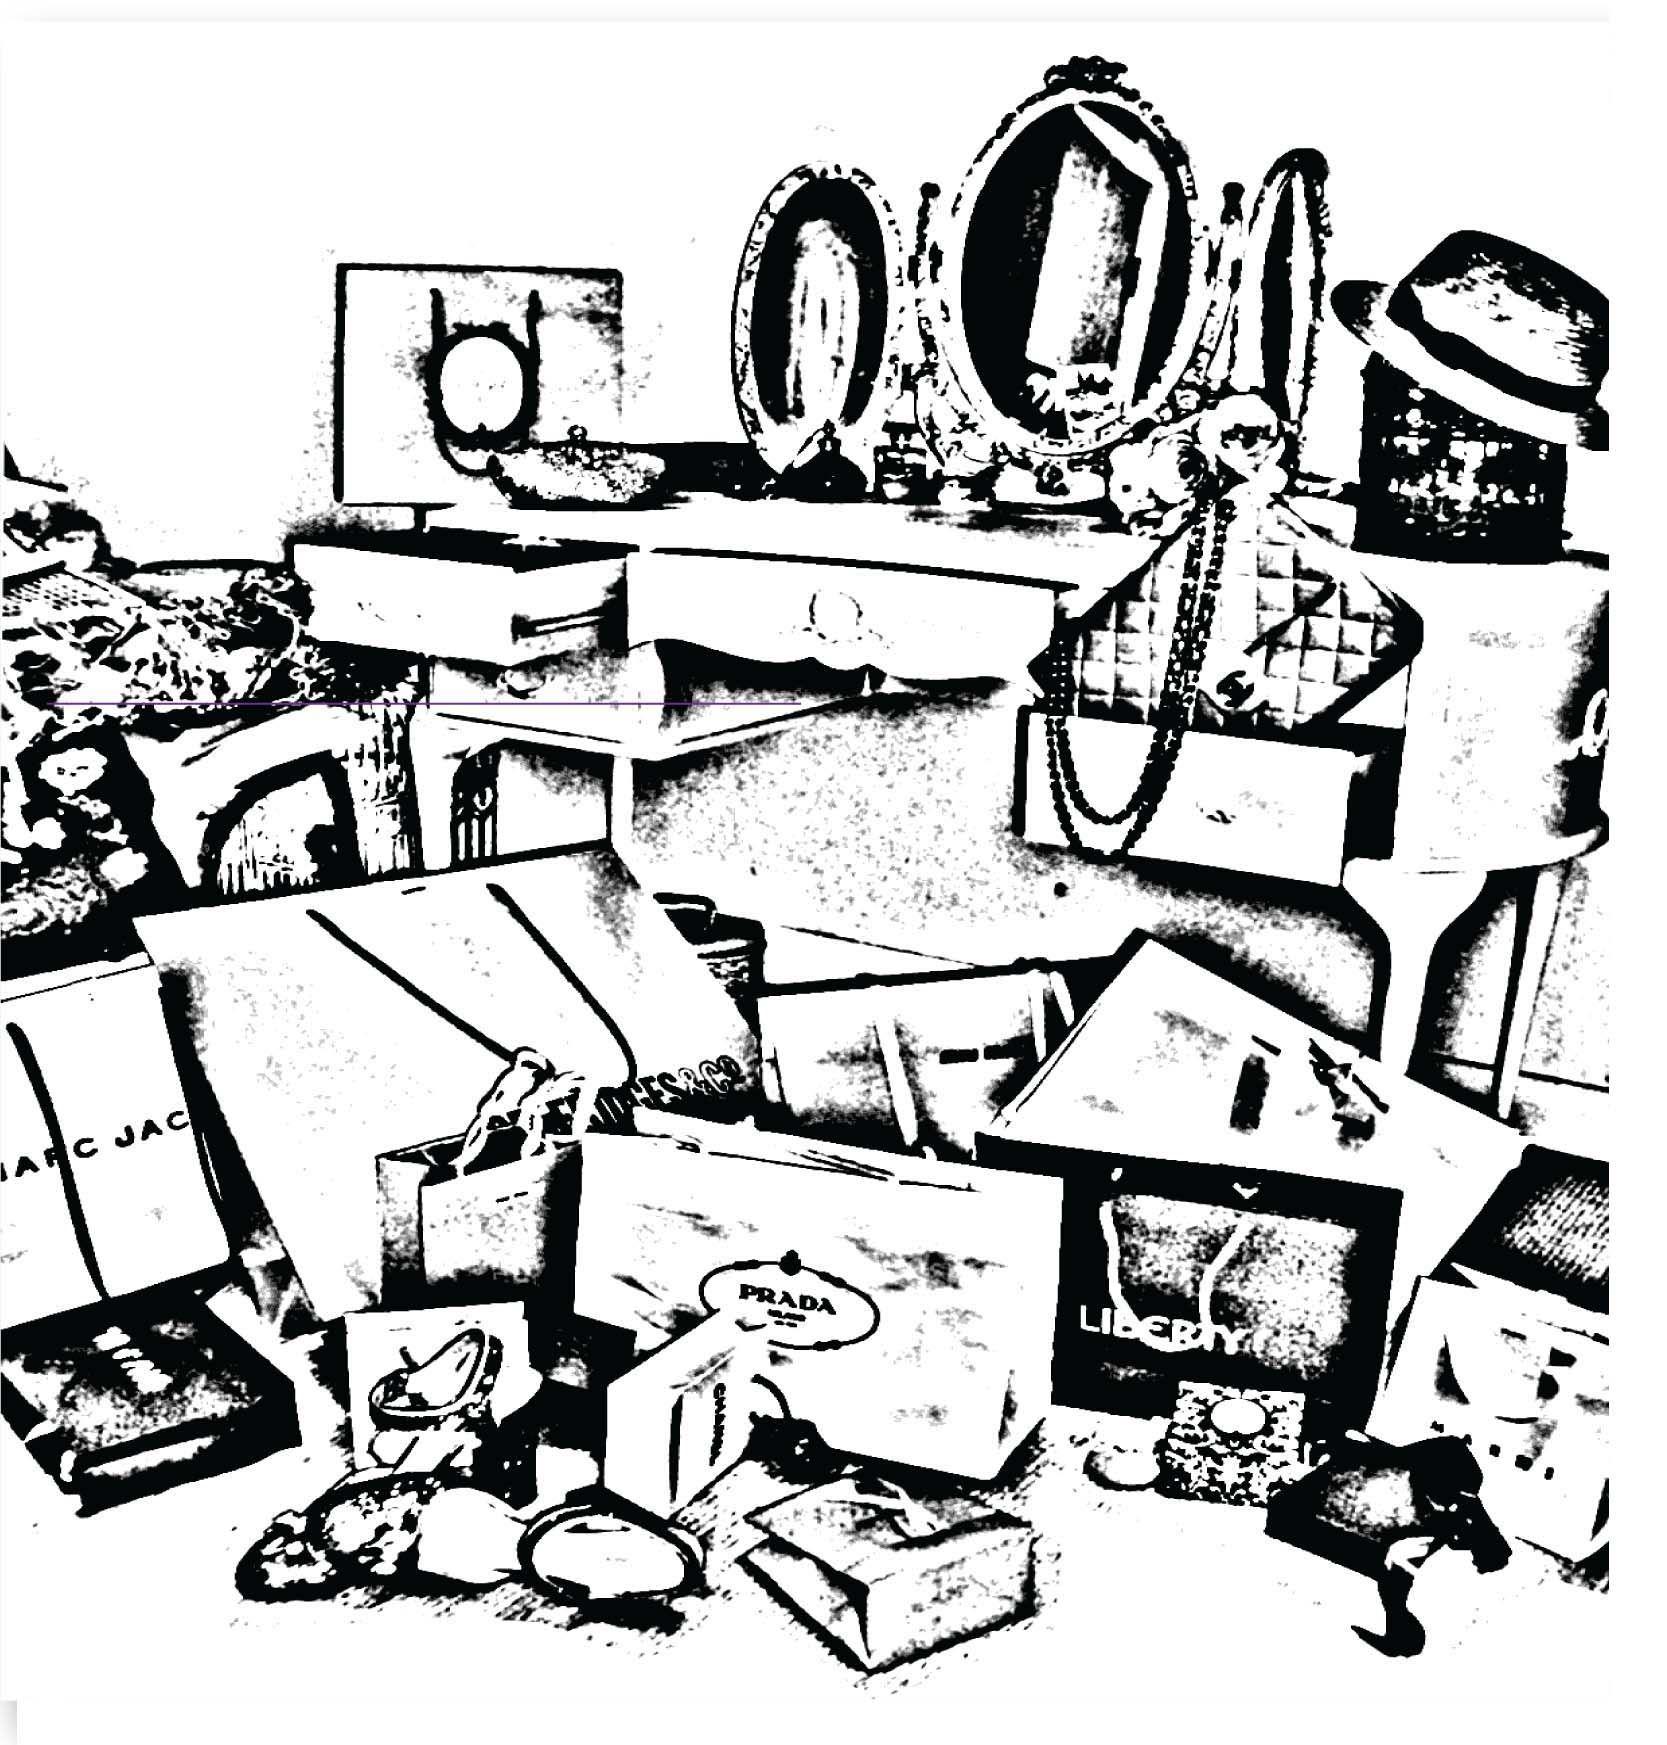 nicola emmie - personal shopper | Log Home Living | Pinterest | Sugaring